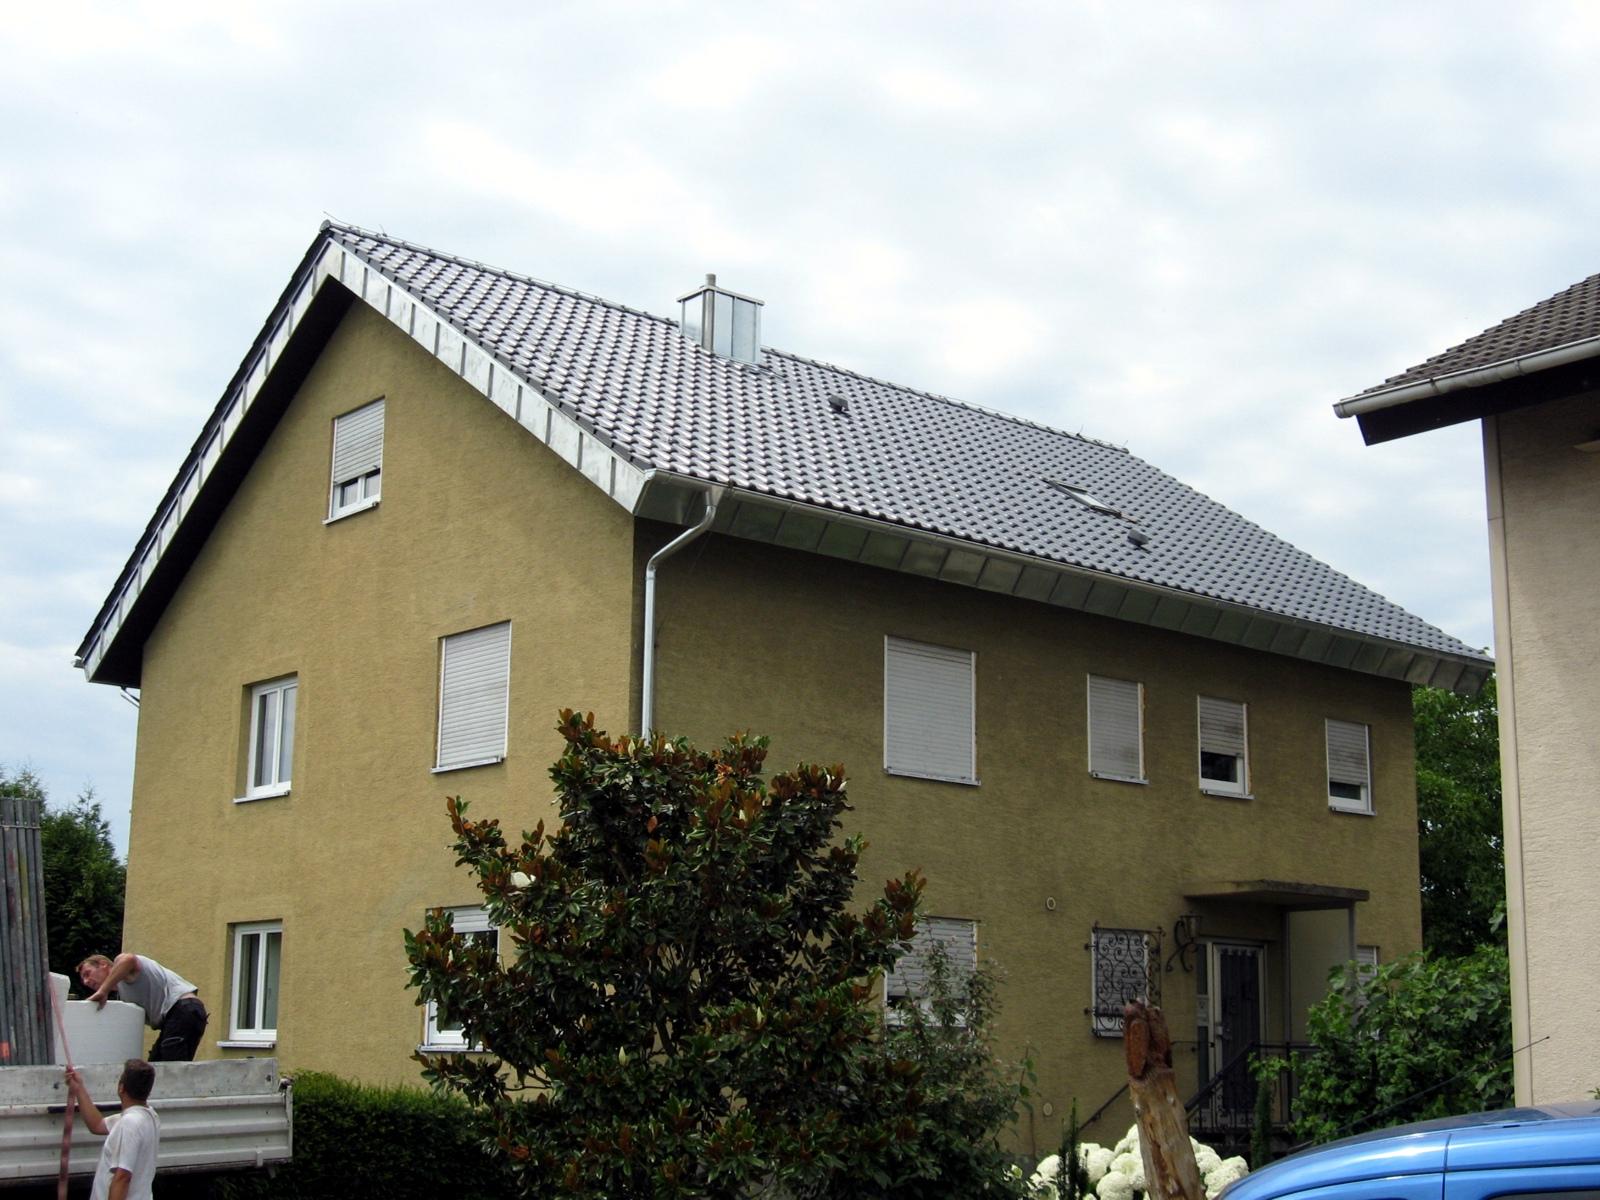 au am rhein steildach speidel dach und fassadenbau. Black Bedroom Furniture Sets. Home Design Ideas